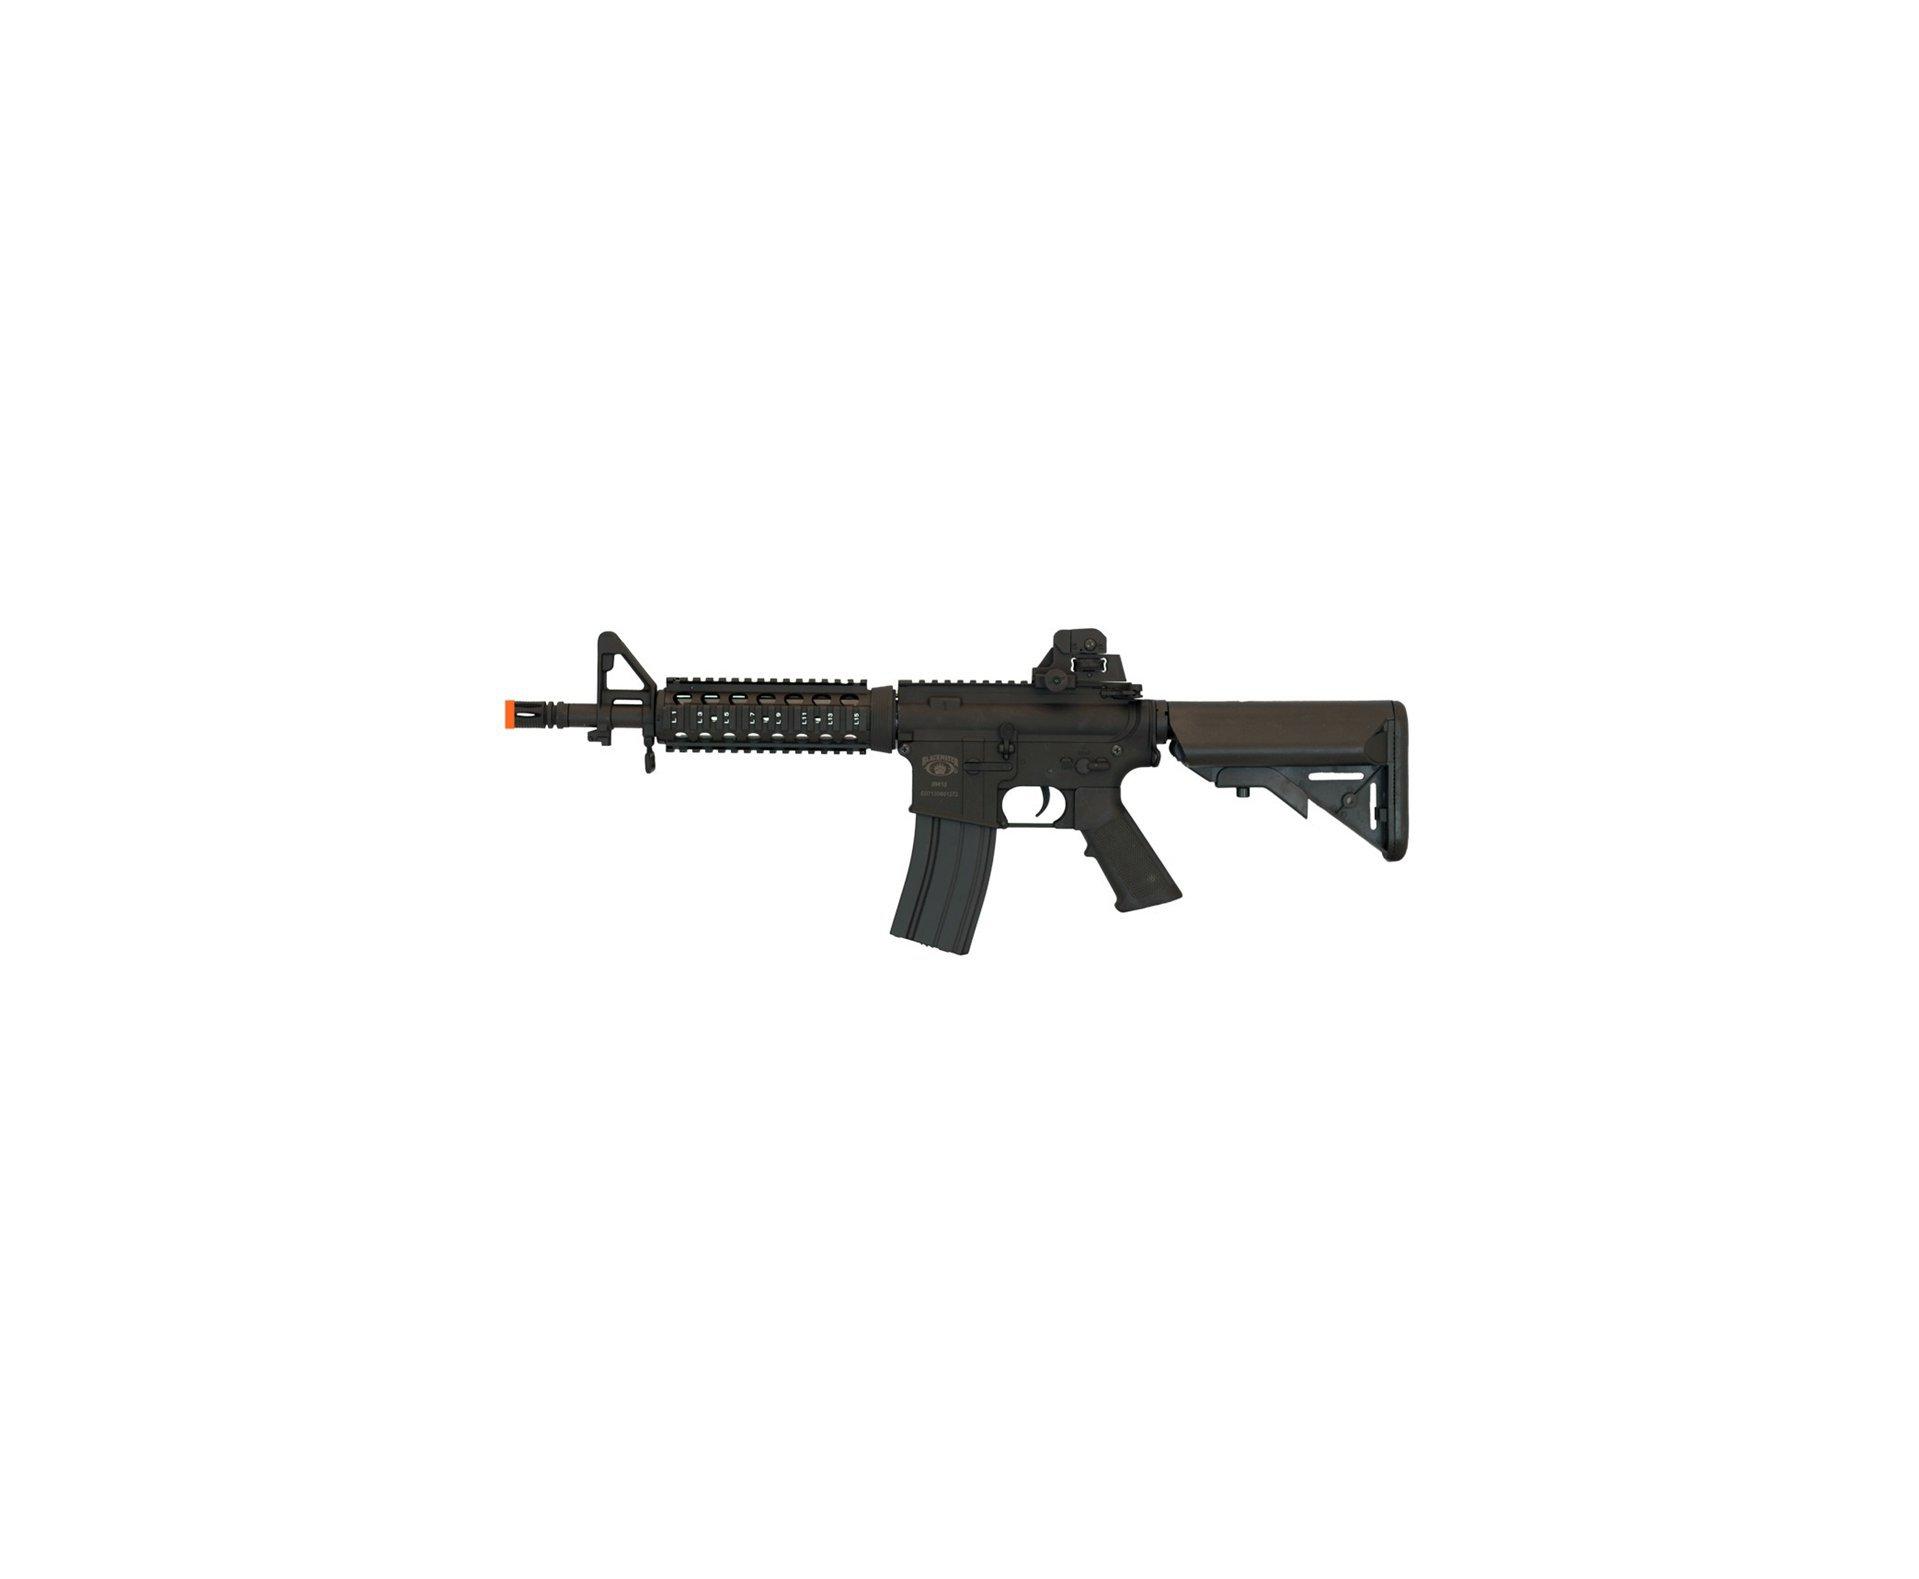 Rifle De Airsoft Compact Bw15 Ris Cal. 6,0 Mm - Blackwater